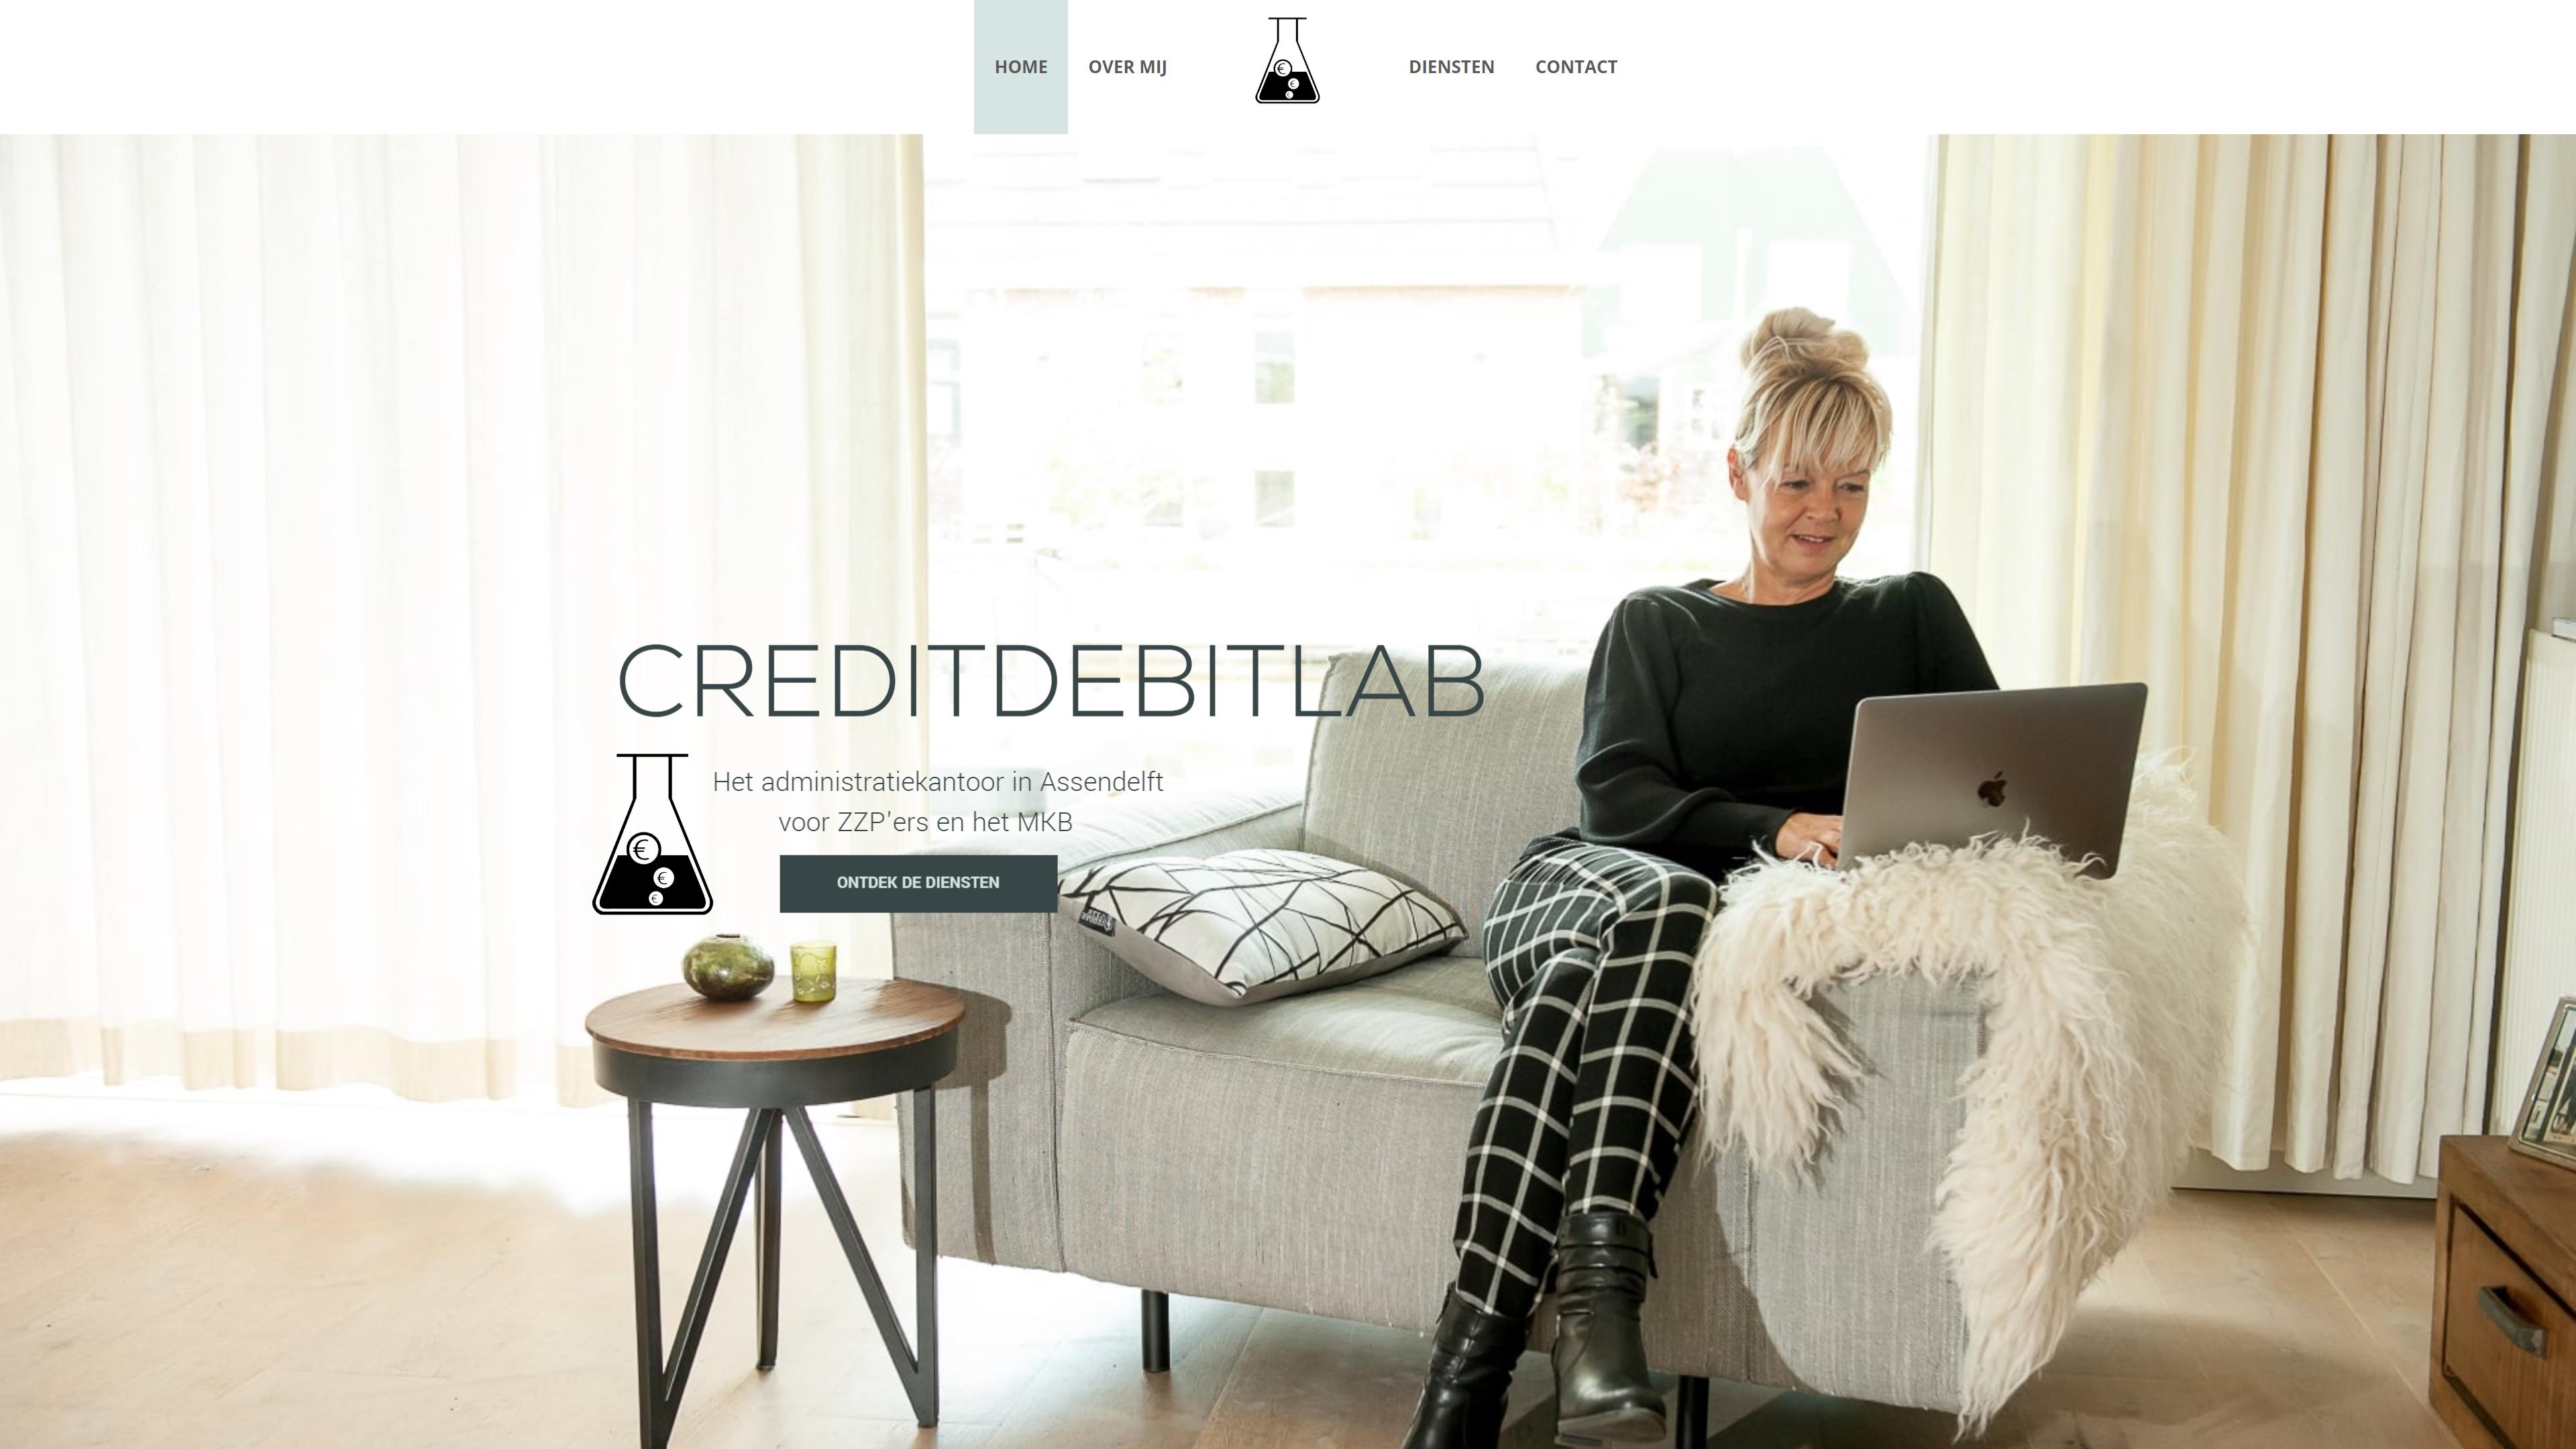 creditdebitlab.nl (WordPress website)